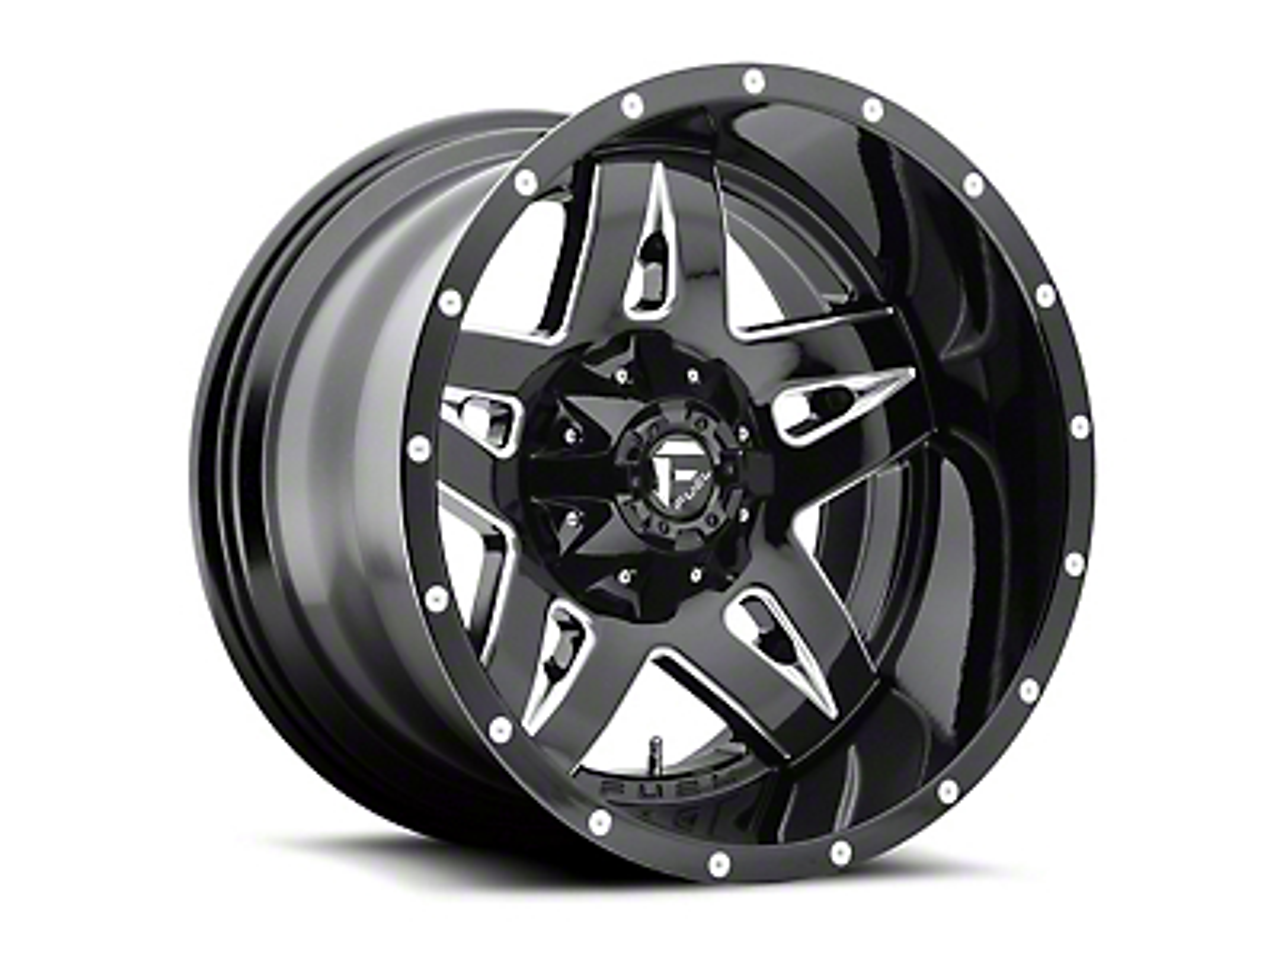 Fuel Wheels Full Blown Black Milled 5-Lug Wheel - 18x9 (02-18 RAM 1500, Excluding Mega Cab)